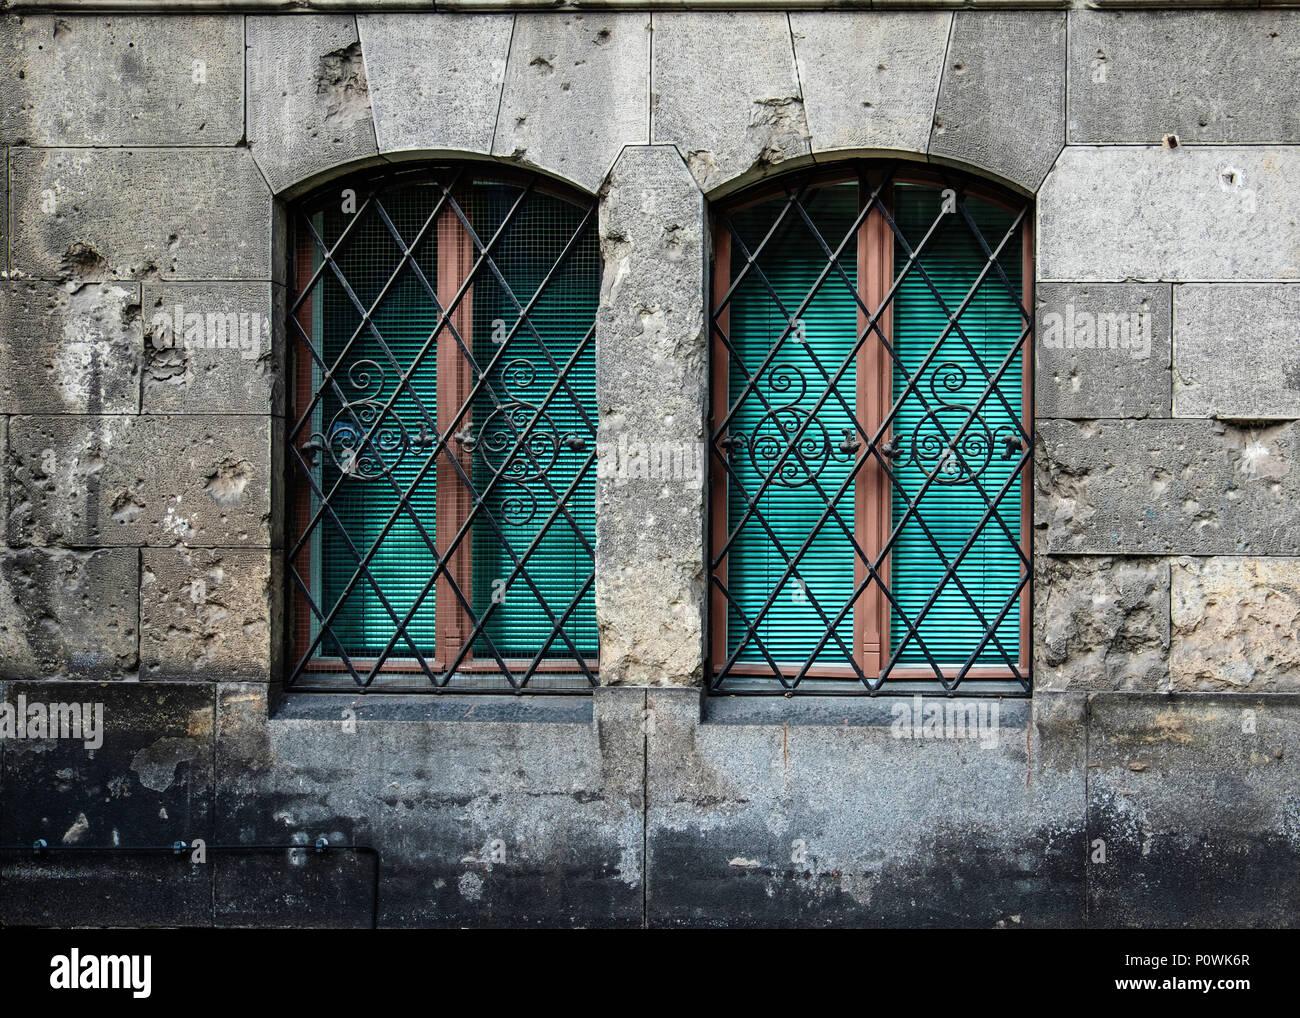 New Jewish Synagogue building detail, War damaged and soot blacked wall & two windows. Oranienburger Straße, Mitte,Berlin - Stock Image